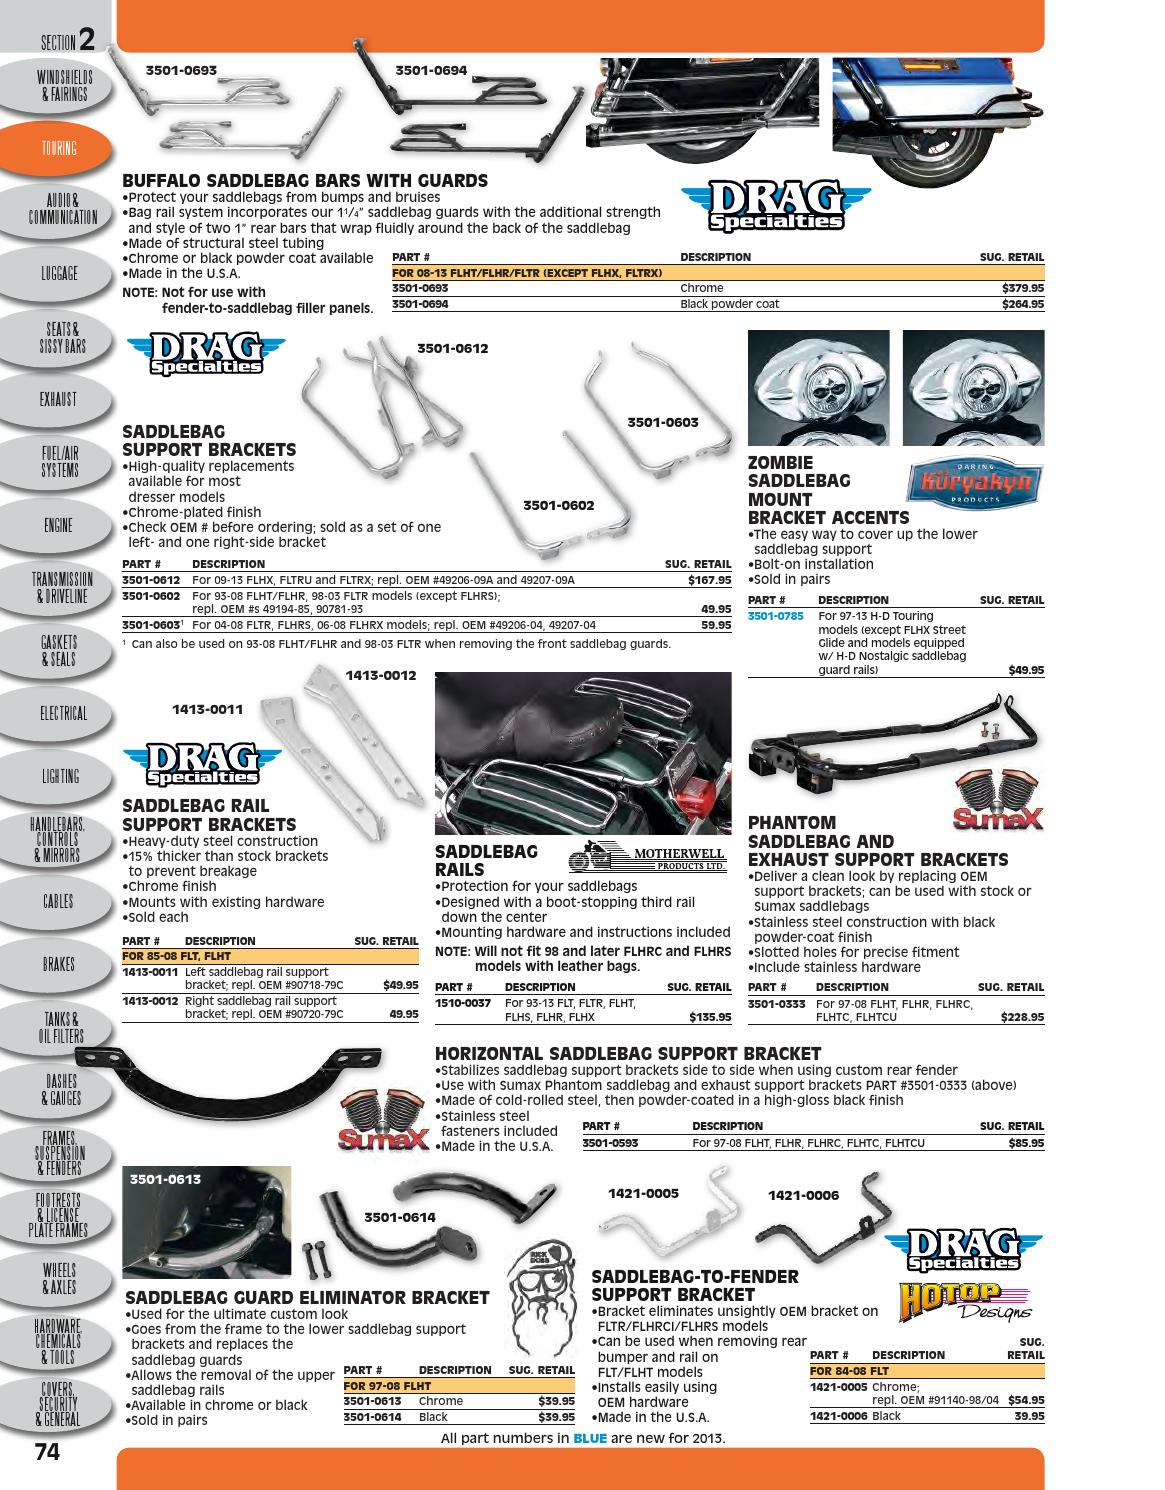 Automotive Drag Specialties 1421-0005 Saddlebag-To-Fender Support Bracket Chrome